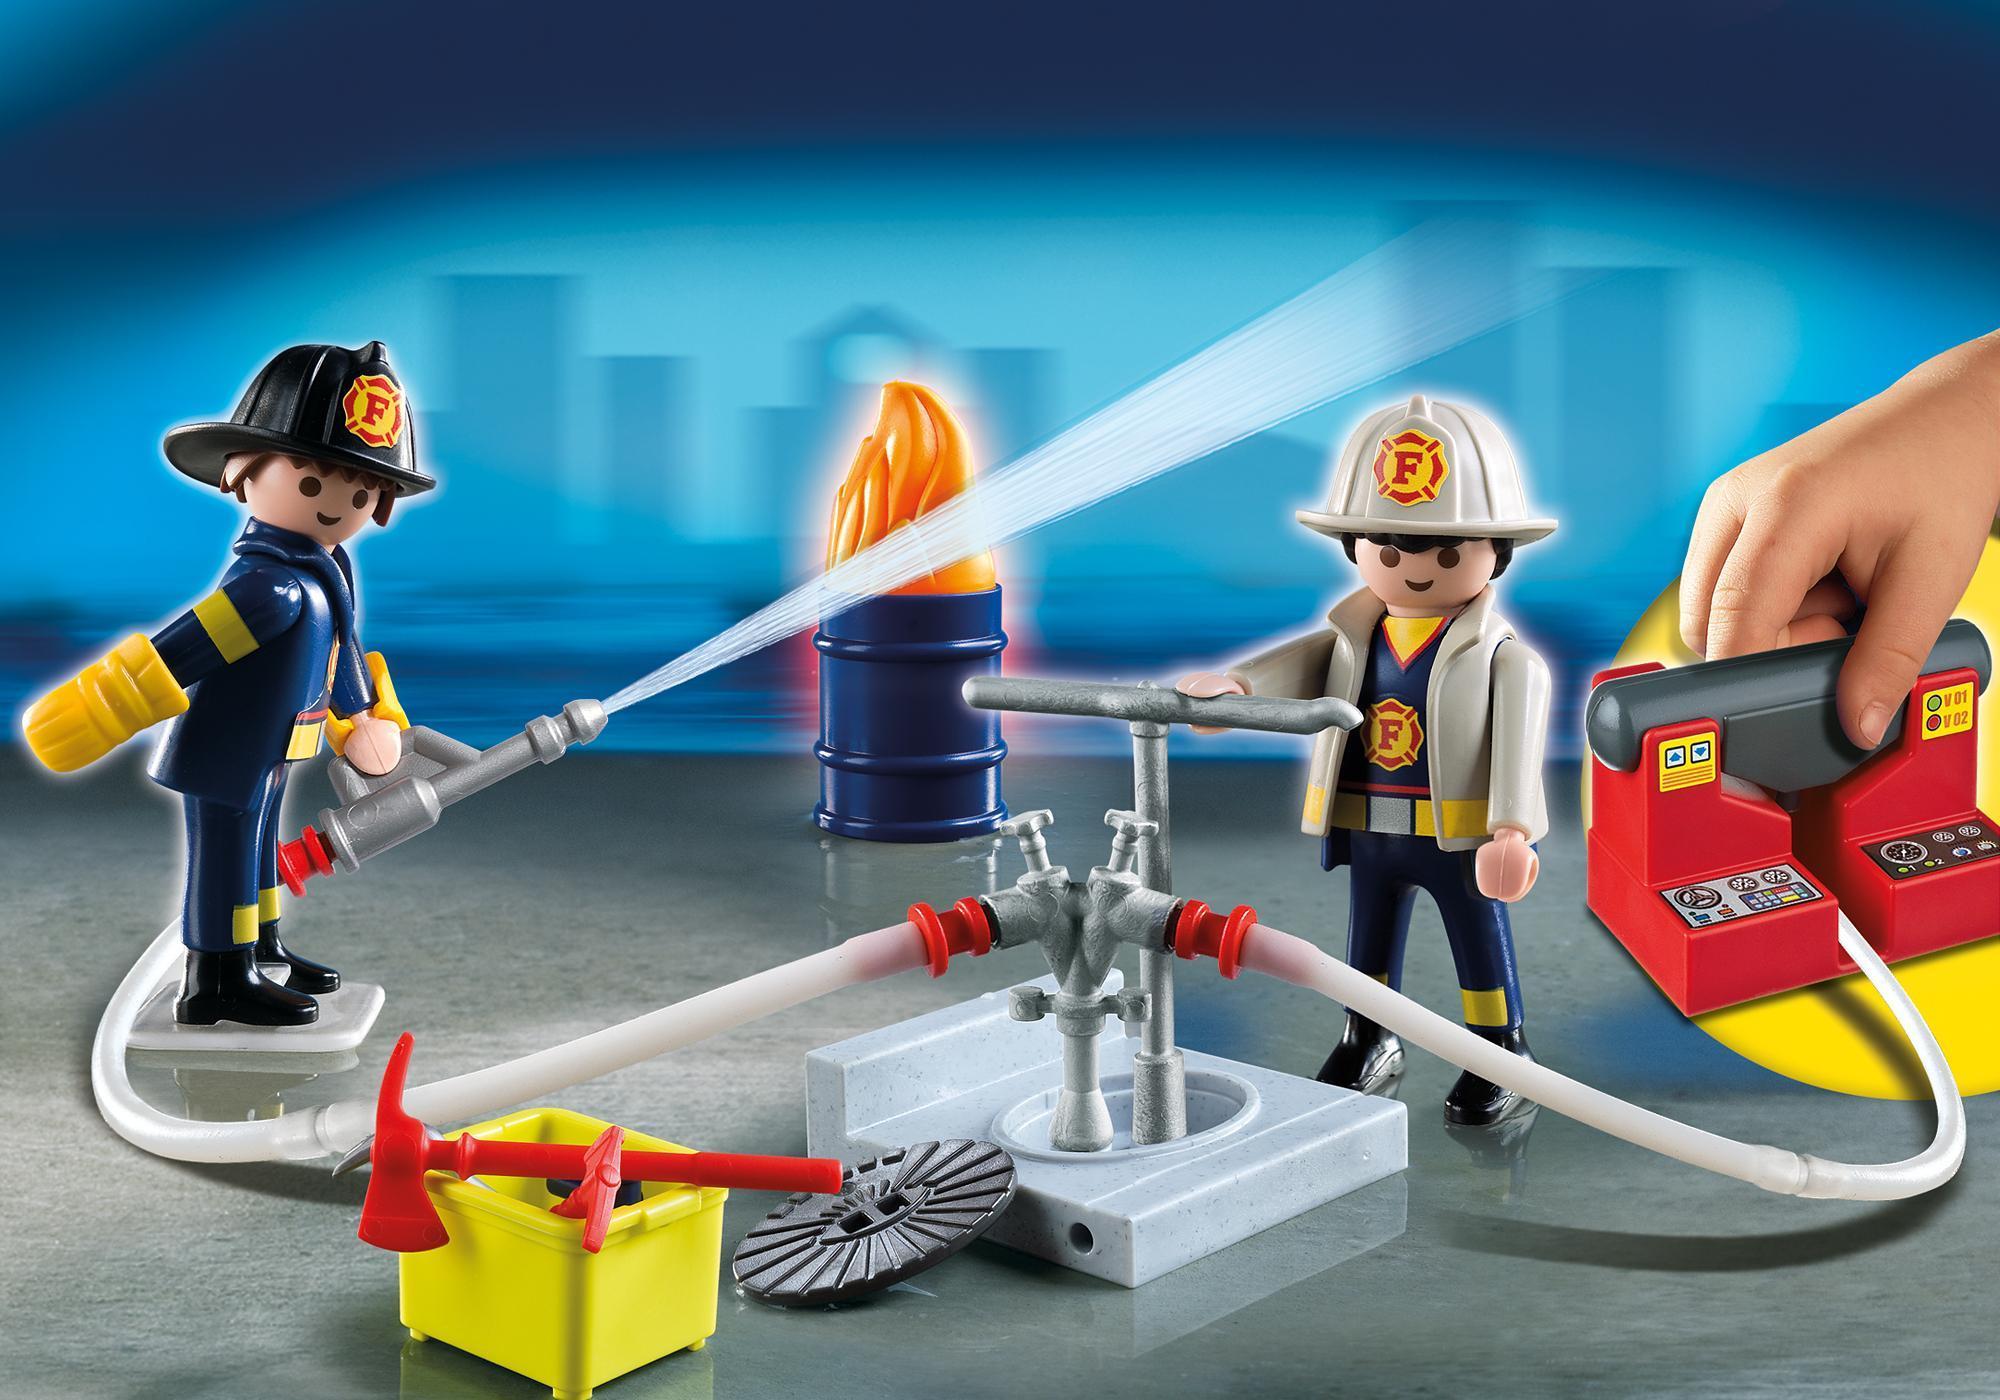 http://media.playmobil.com/i/playmobil/5651_product_detail/Fire Rescue Carry Case